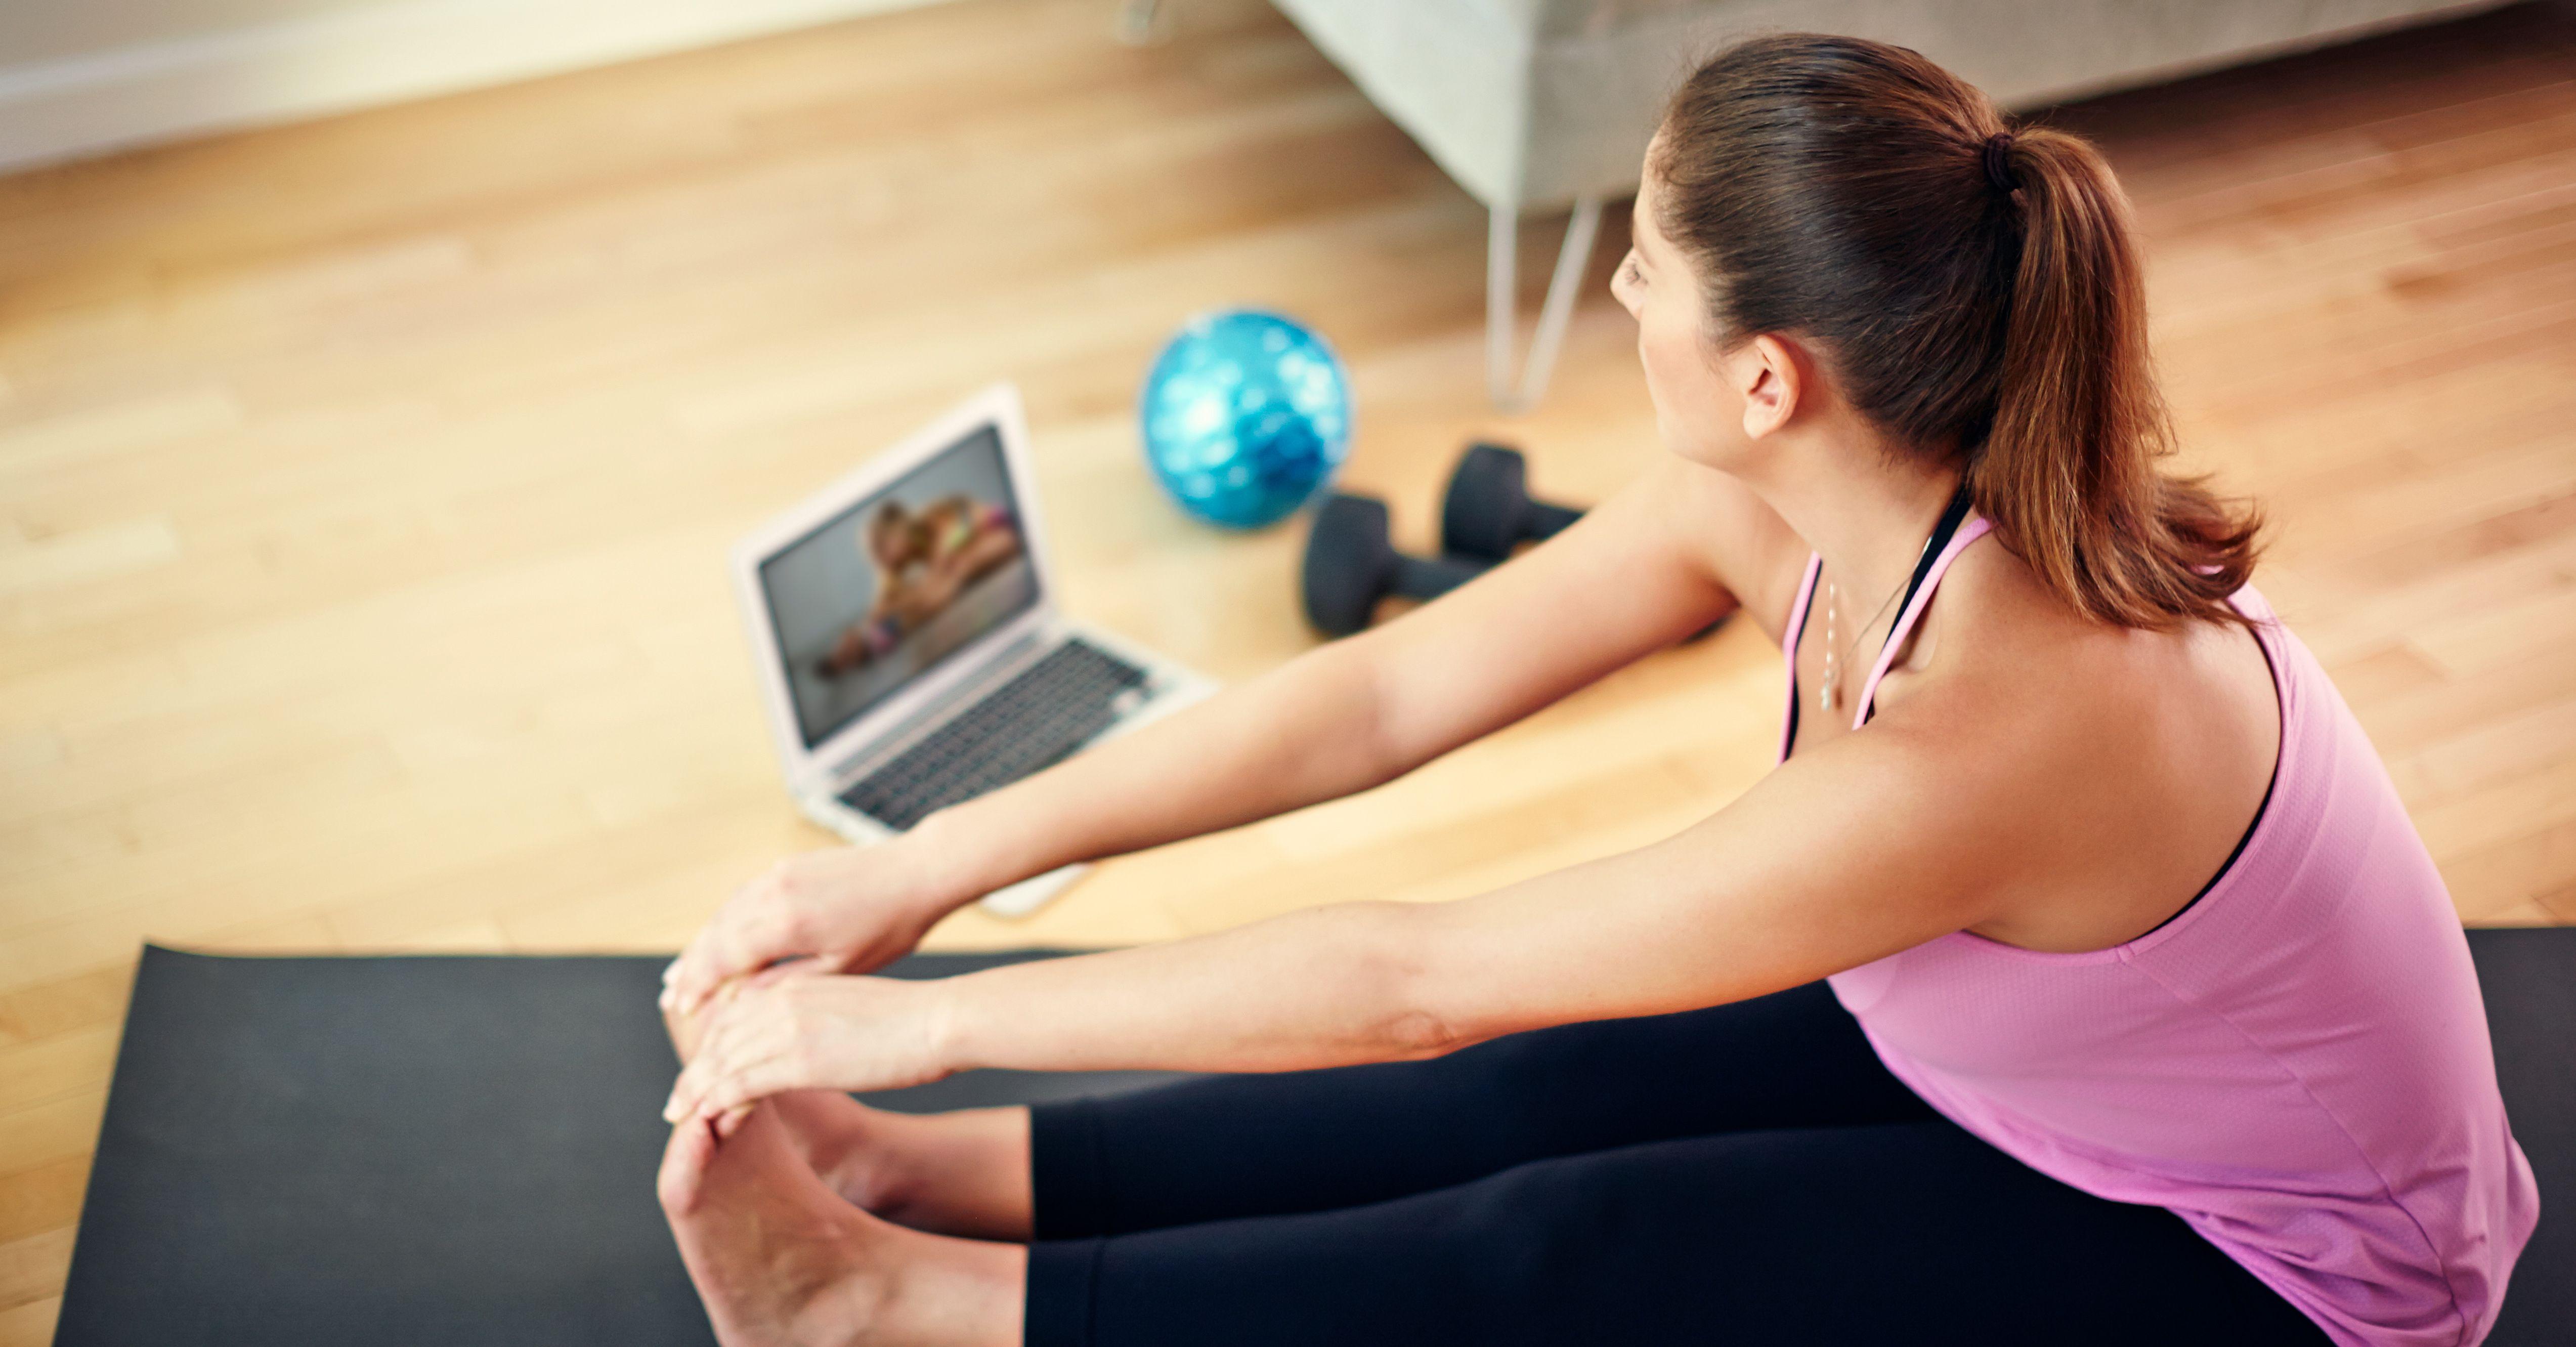 Home-Workout-Fitness-Gadgets-f-r-dein-Training-zu-Hause